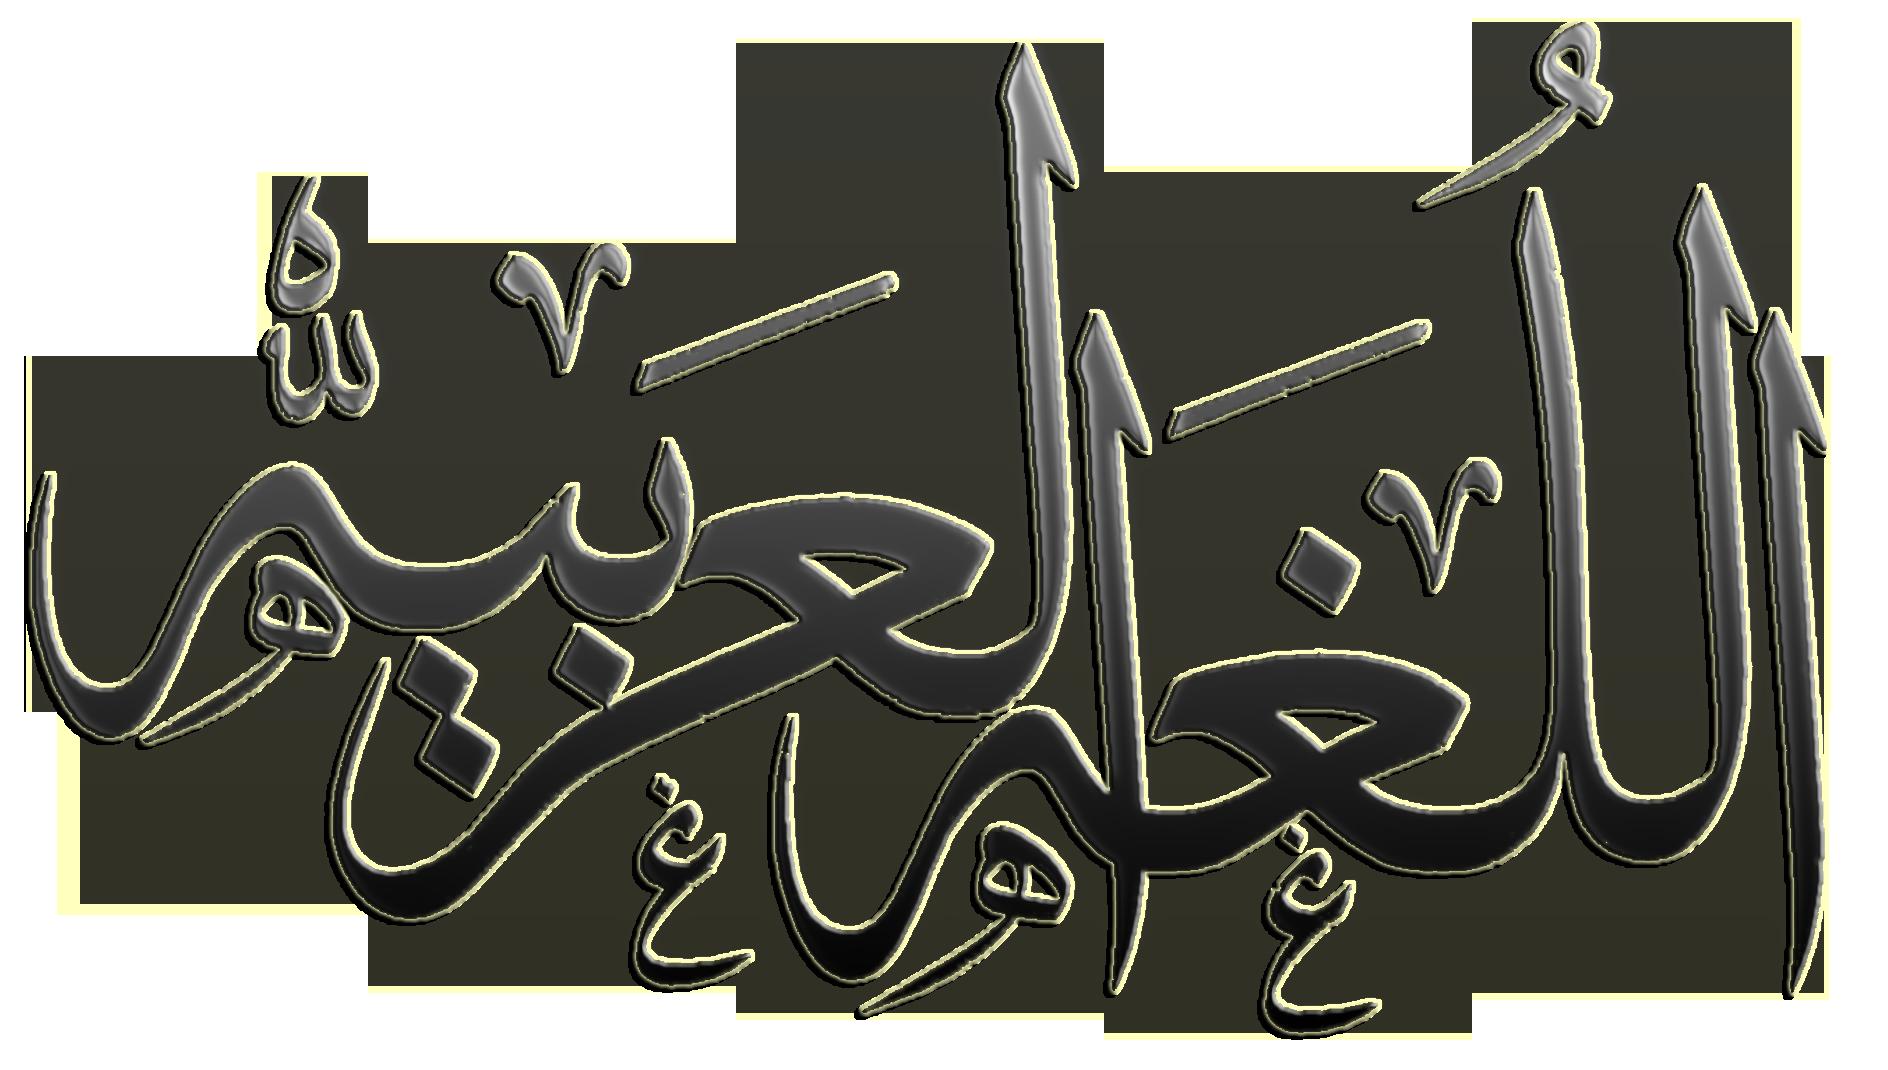 j'adore la langue arabe